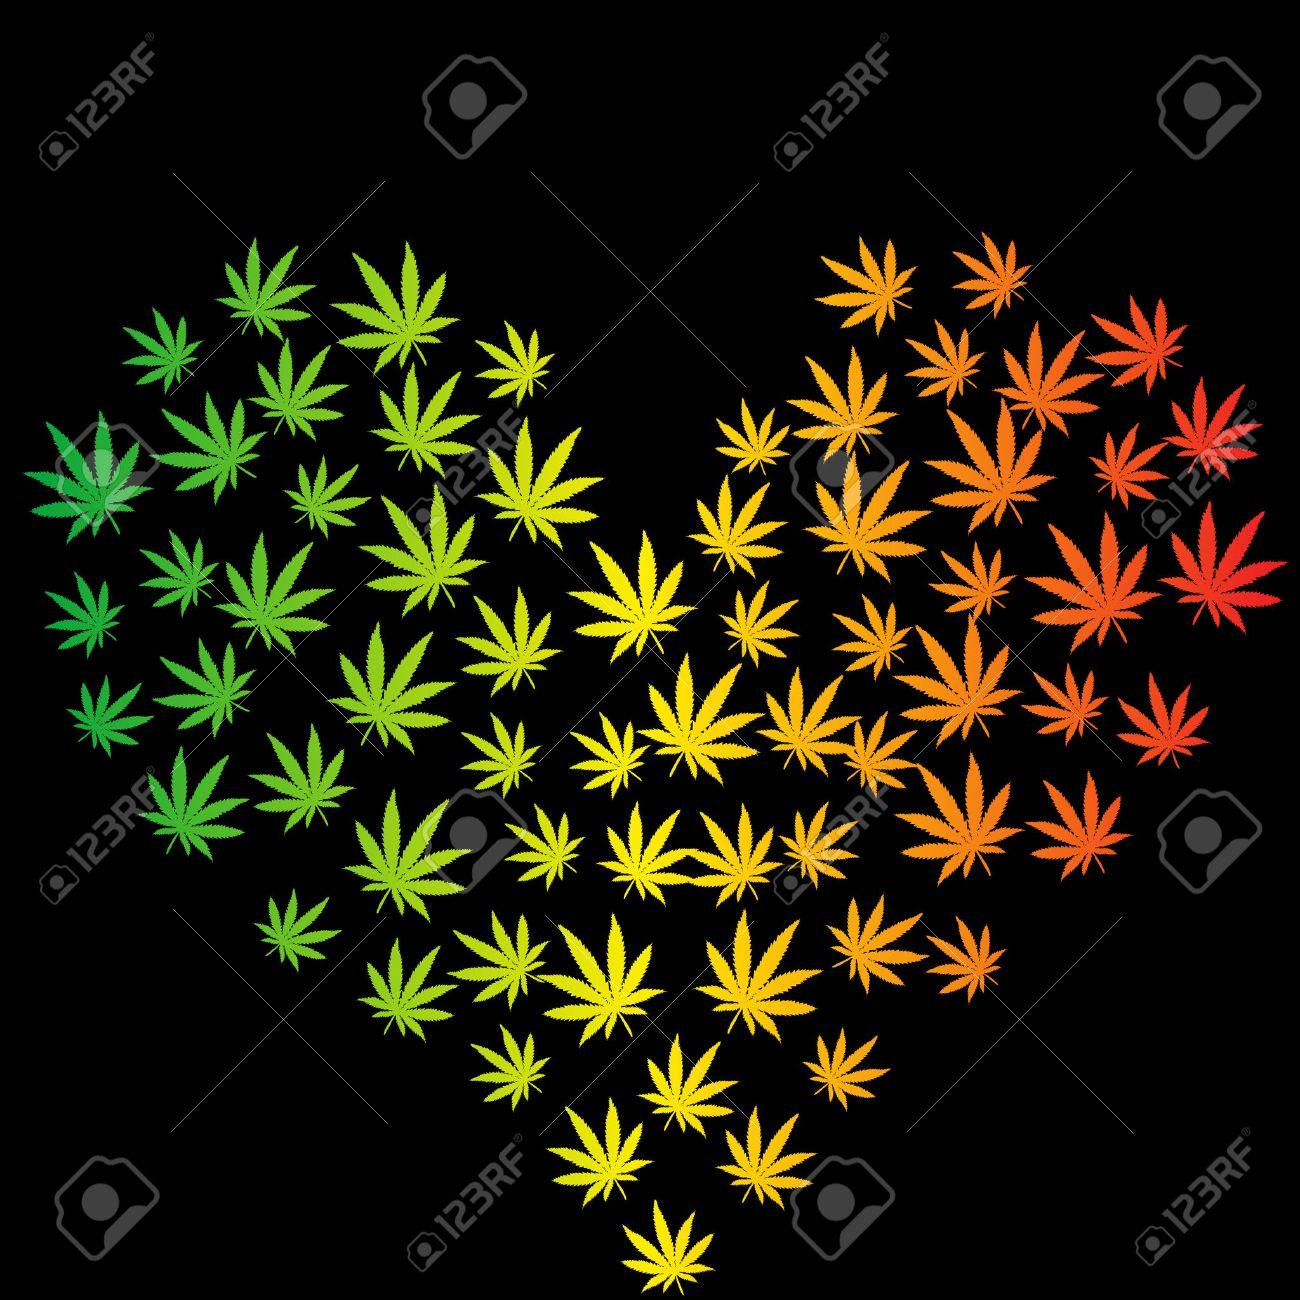 Marihuana Dibujos Fotos Dibujos y Gifs Marihuana